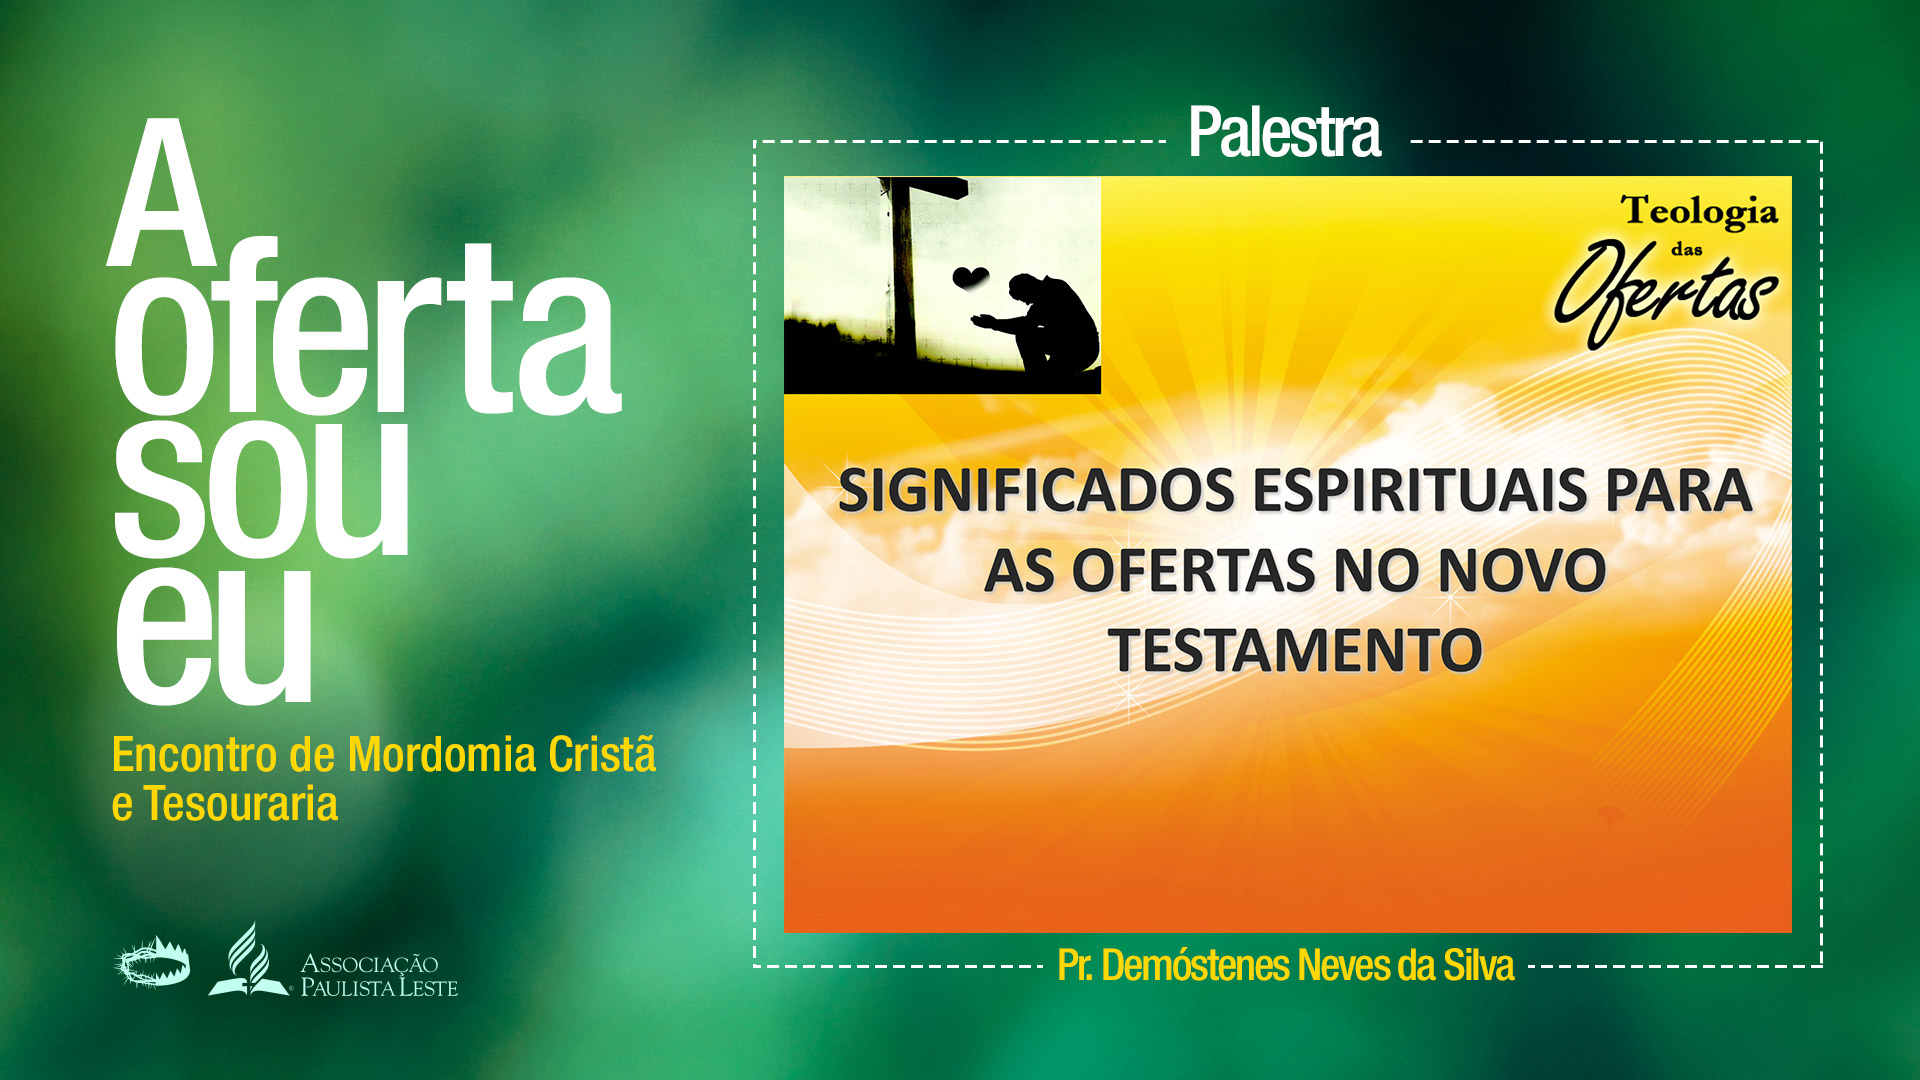 (PPT) Significados espirituais para as ofertas no Novo Testamento – Pr. Demóstenes Neves da Silva